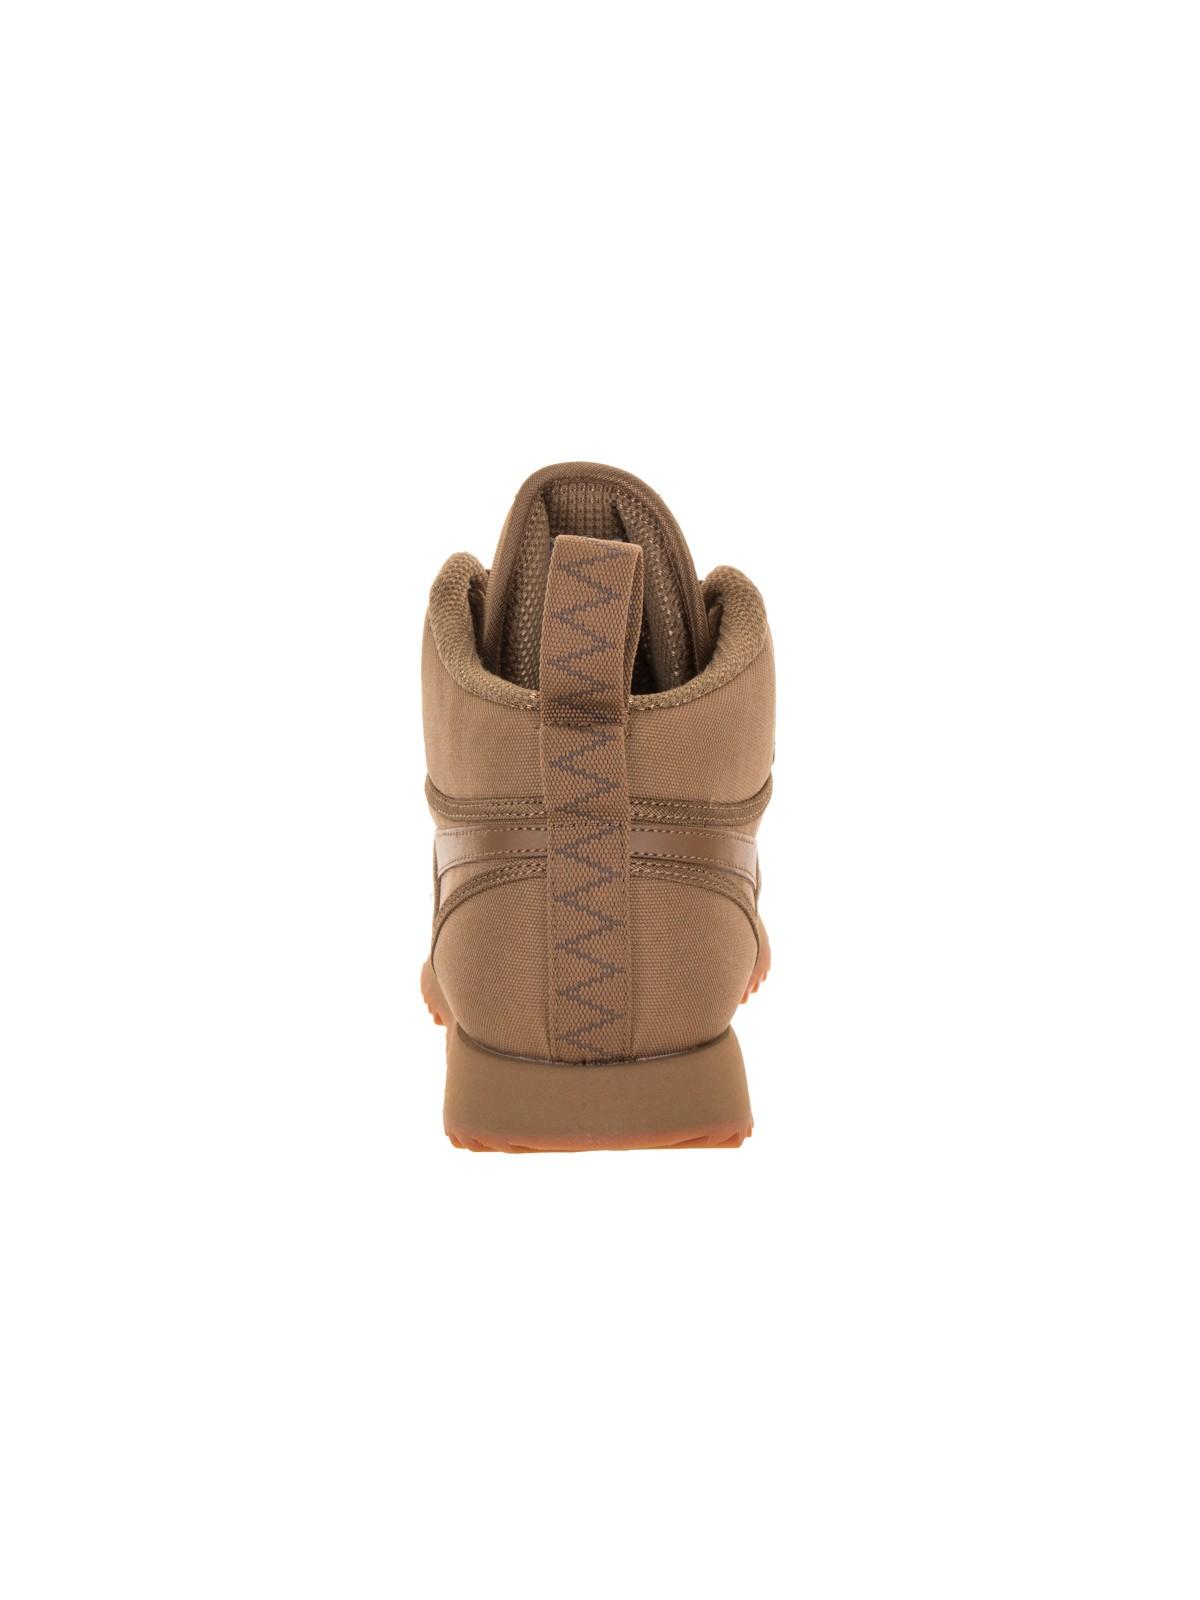 a04b7e2101b3 Reebok - Reebok Men s Classic Leather Mid Ripple TB Casual Shoe -  Walmart.com